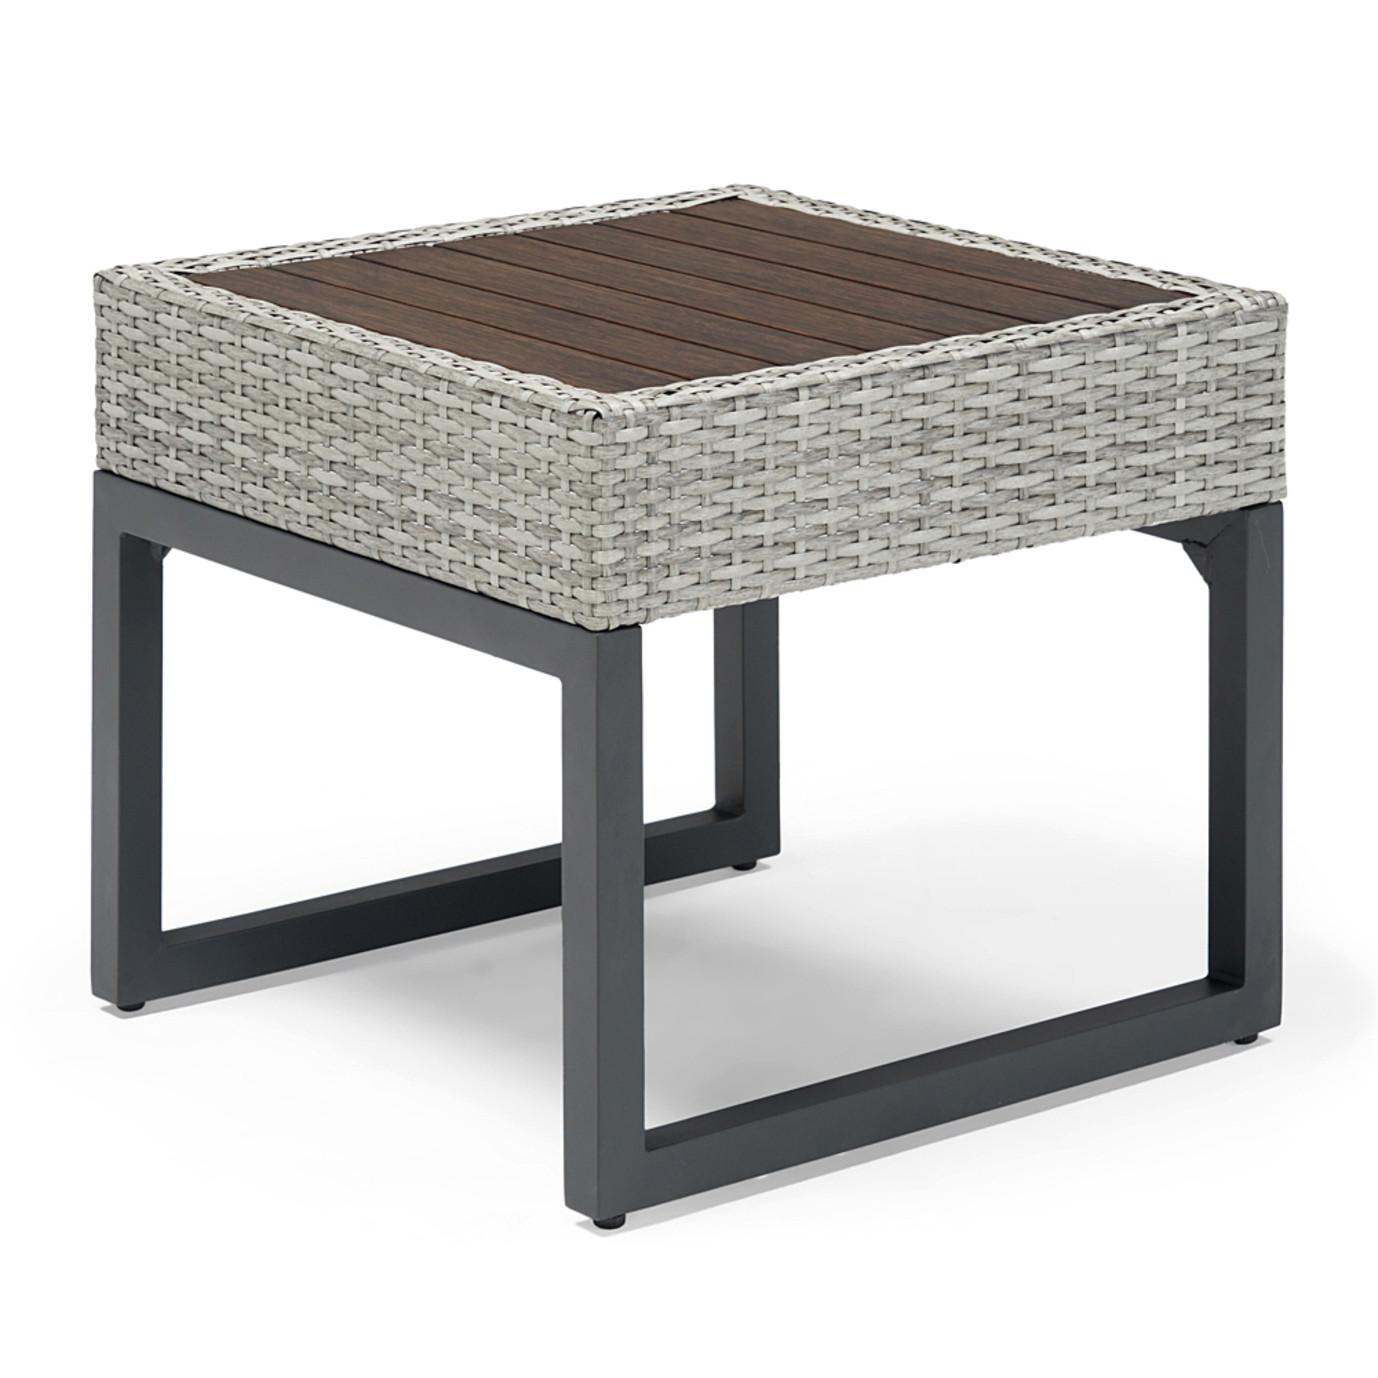 Milo Gray 8 Piece Motion Seating Set - Maxim Beige